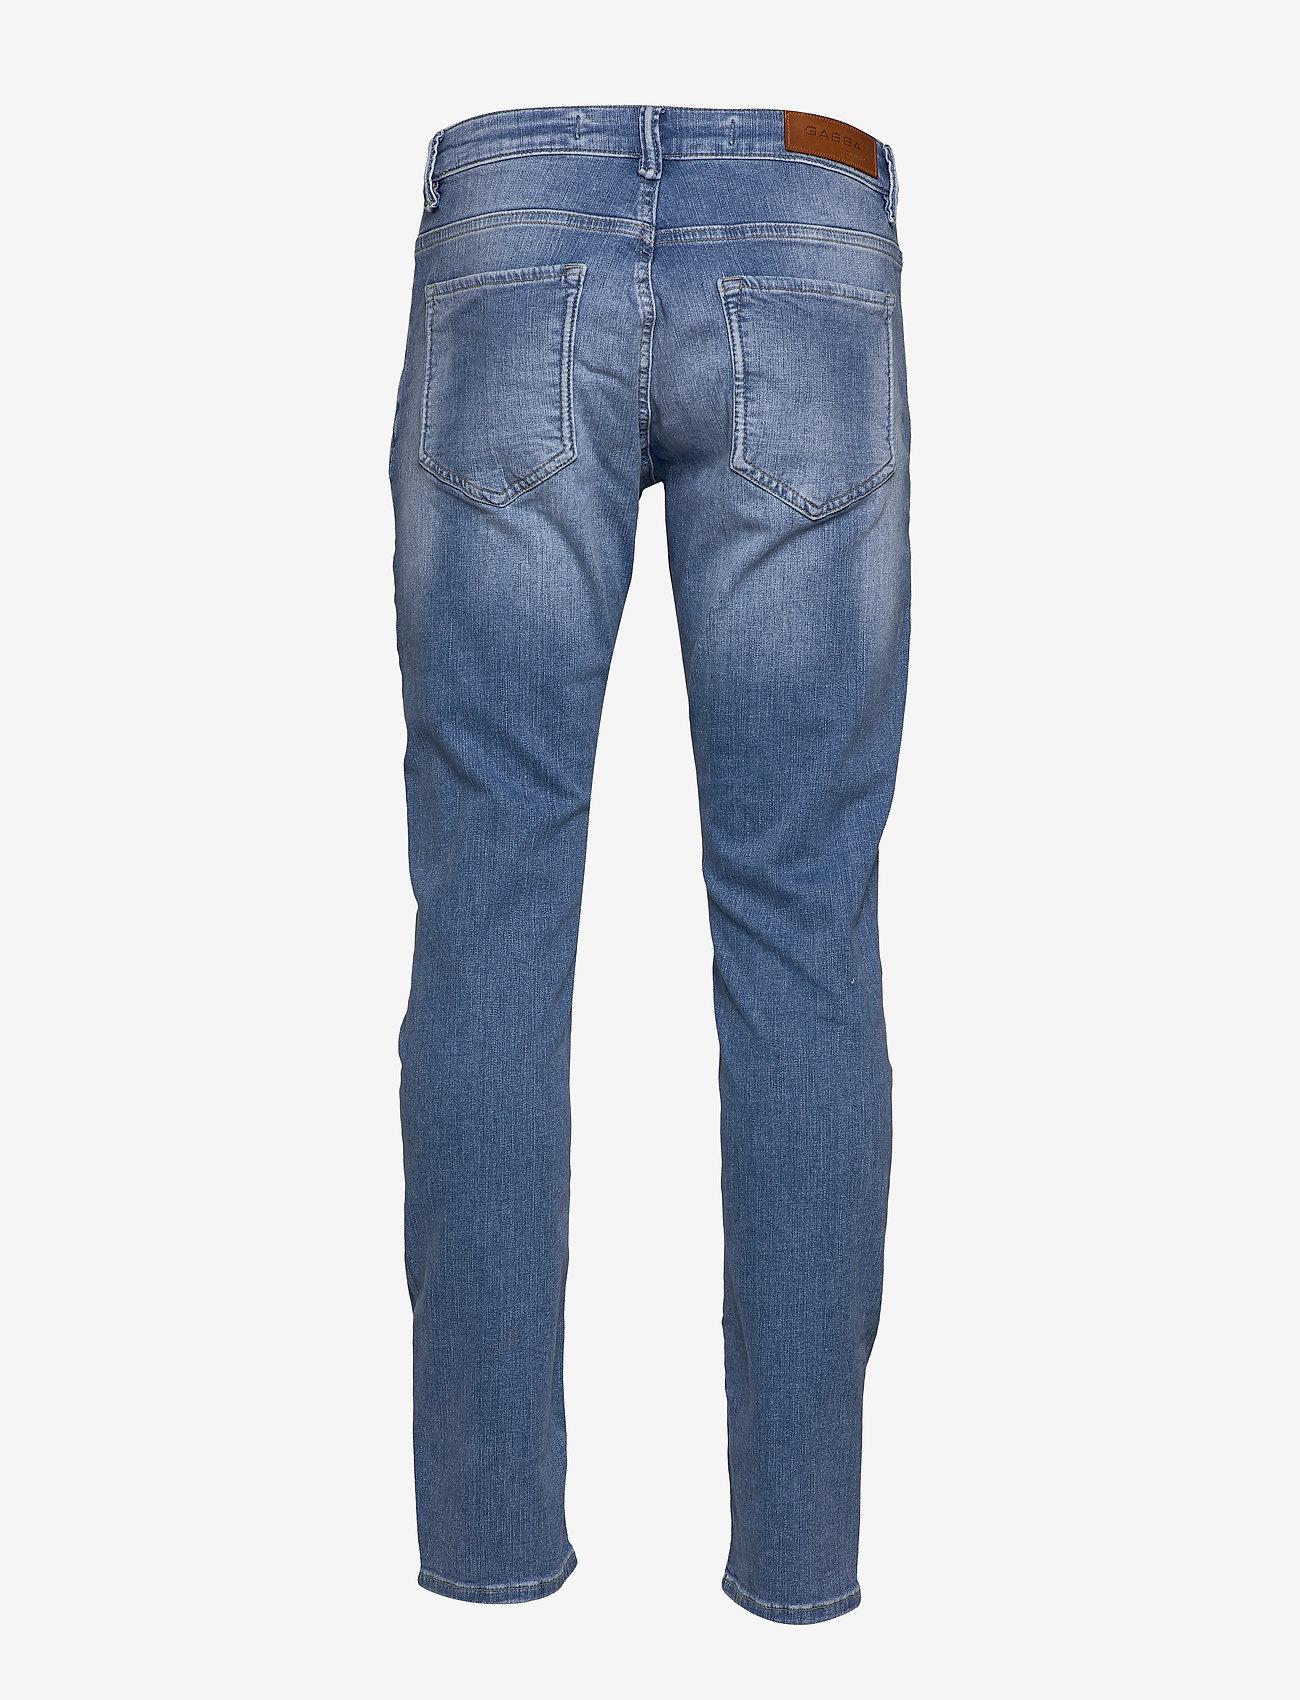 Gabba - Jones K2615 Lt. - slim jeans - rs1257 - 1